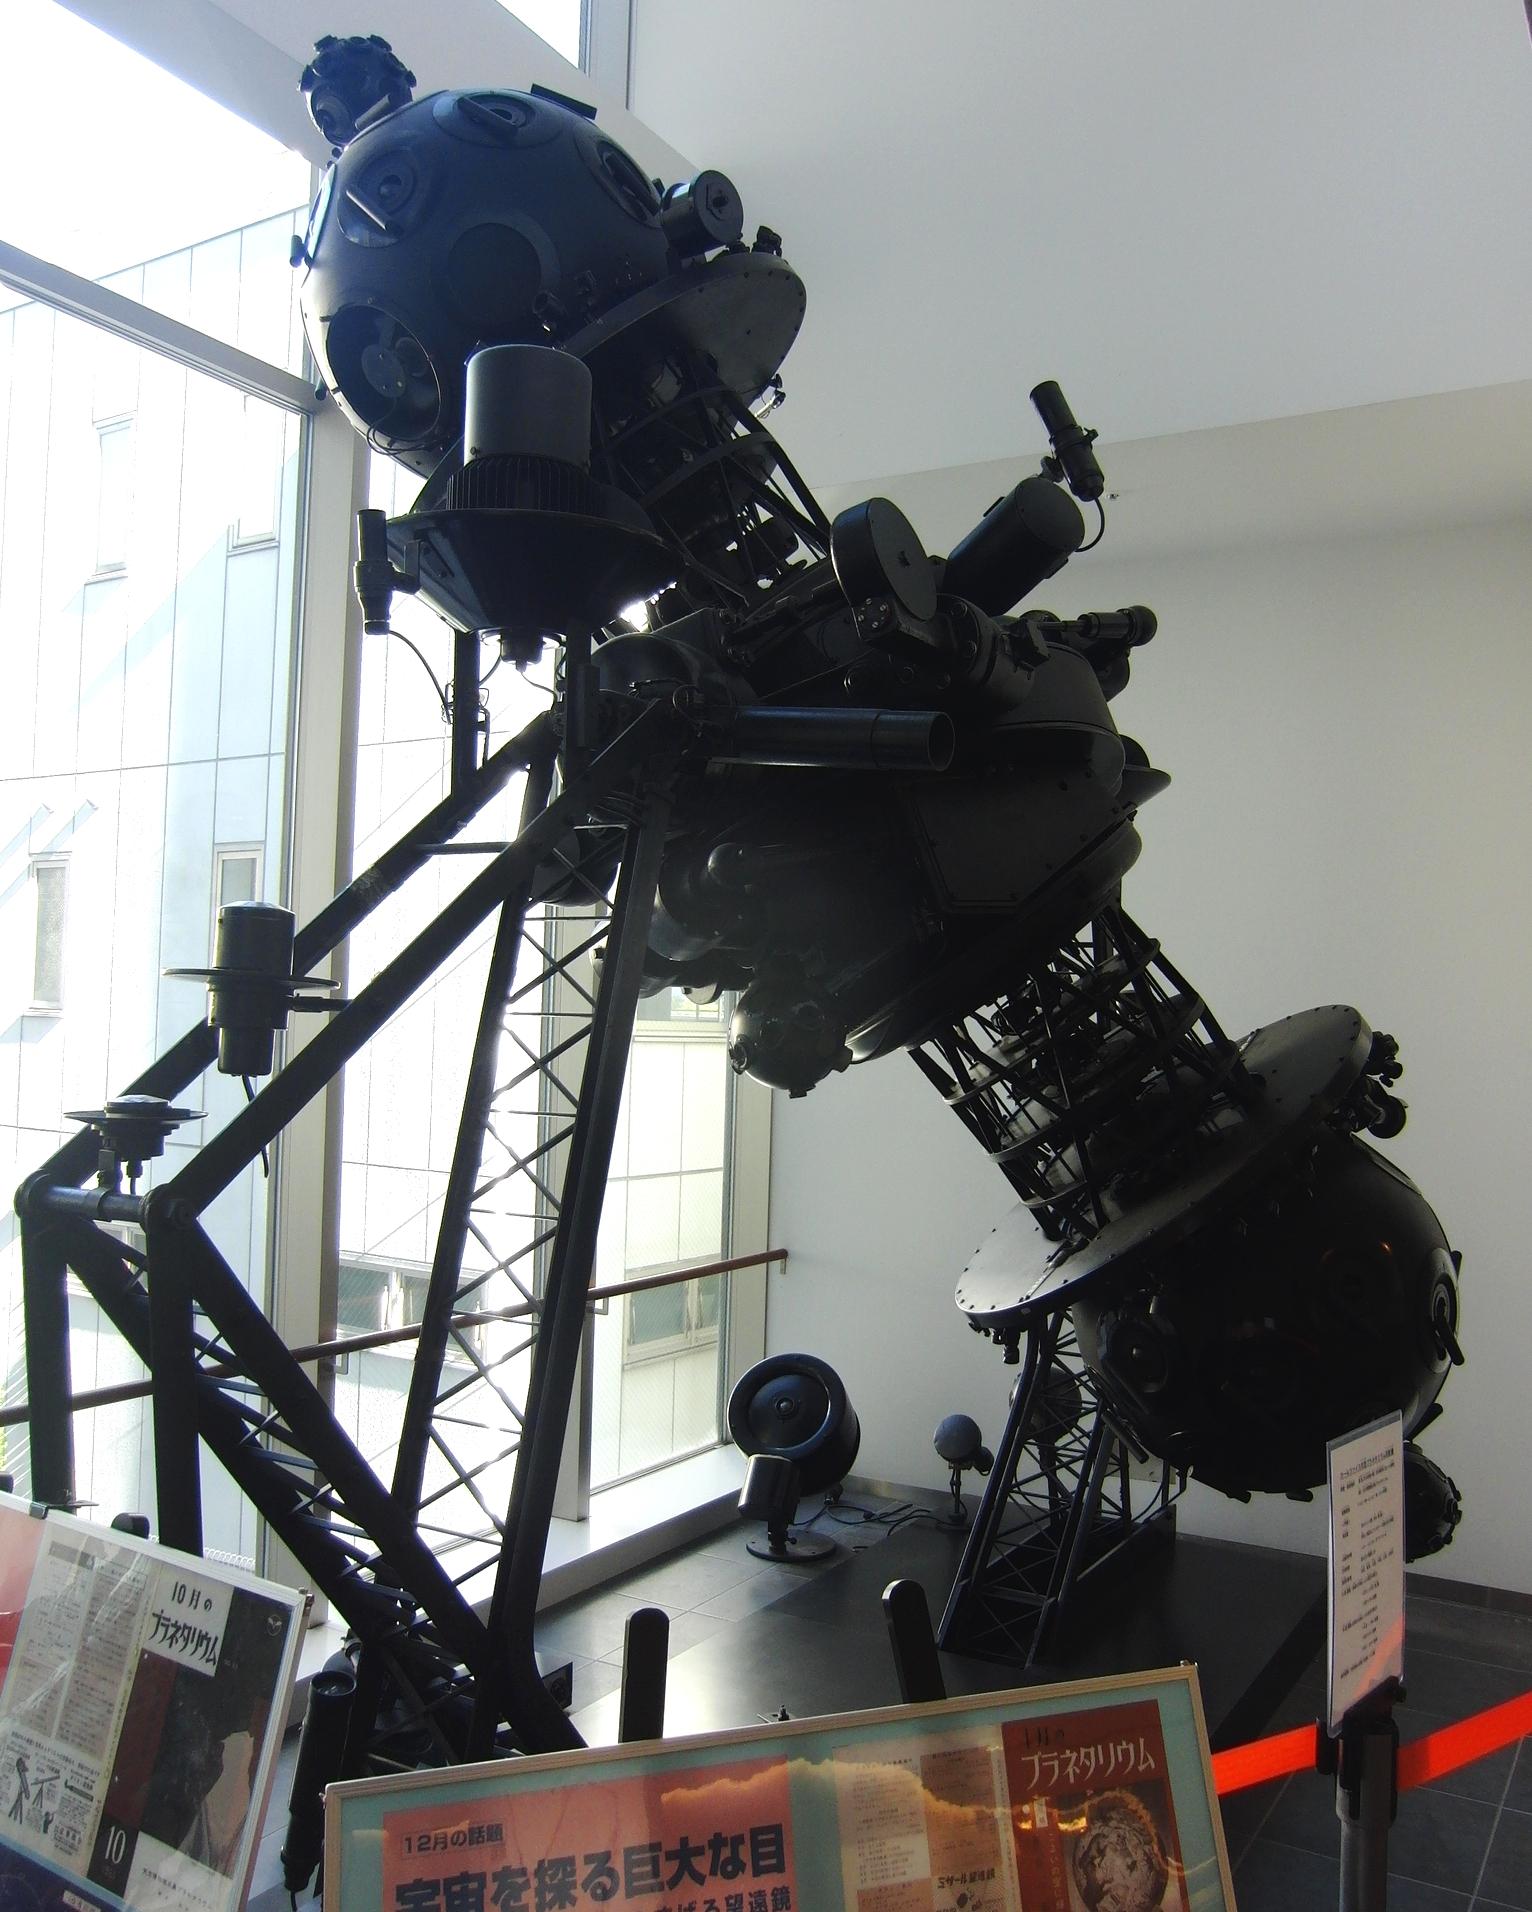 File:Planetarium projector Shibuya jpg - Wikimedia Commons